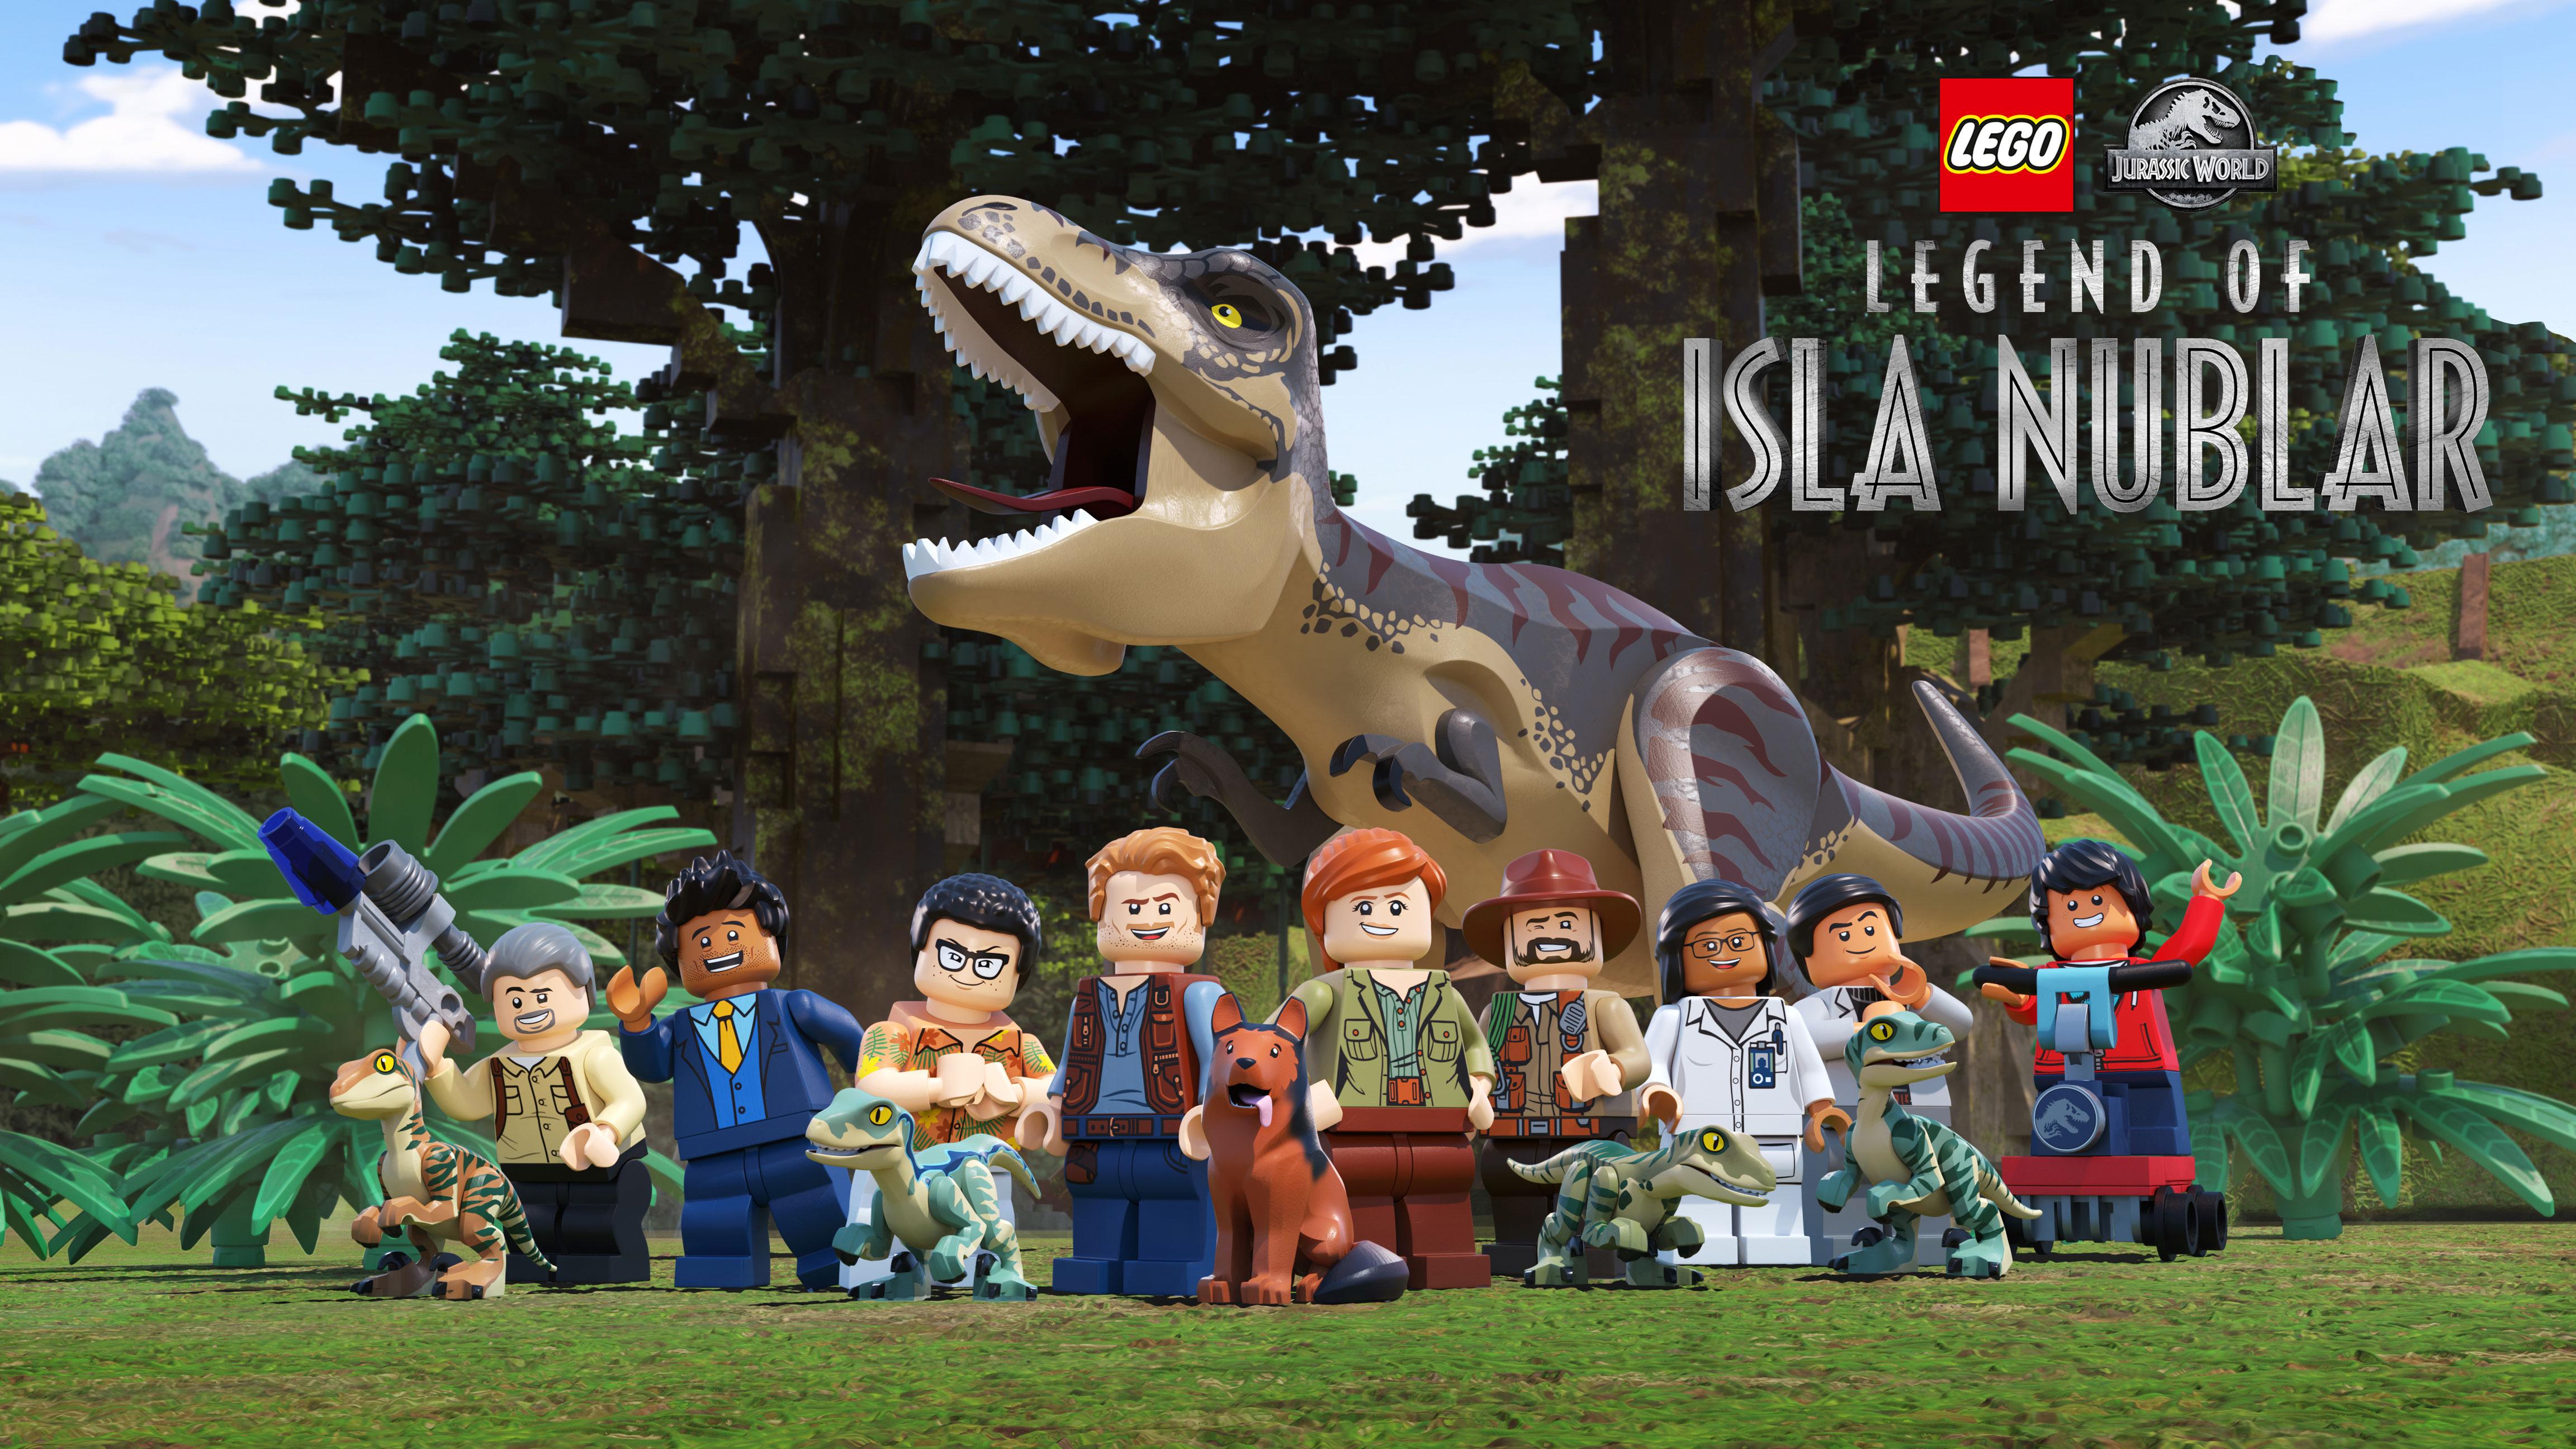 Legend of Isla Nublar